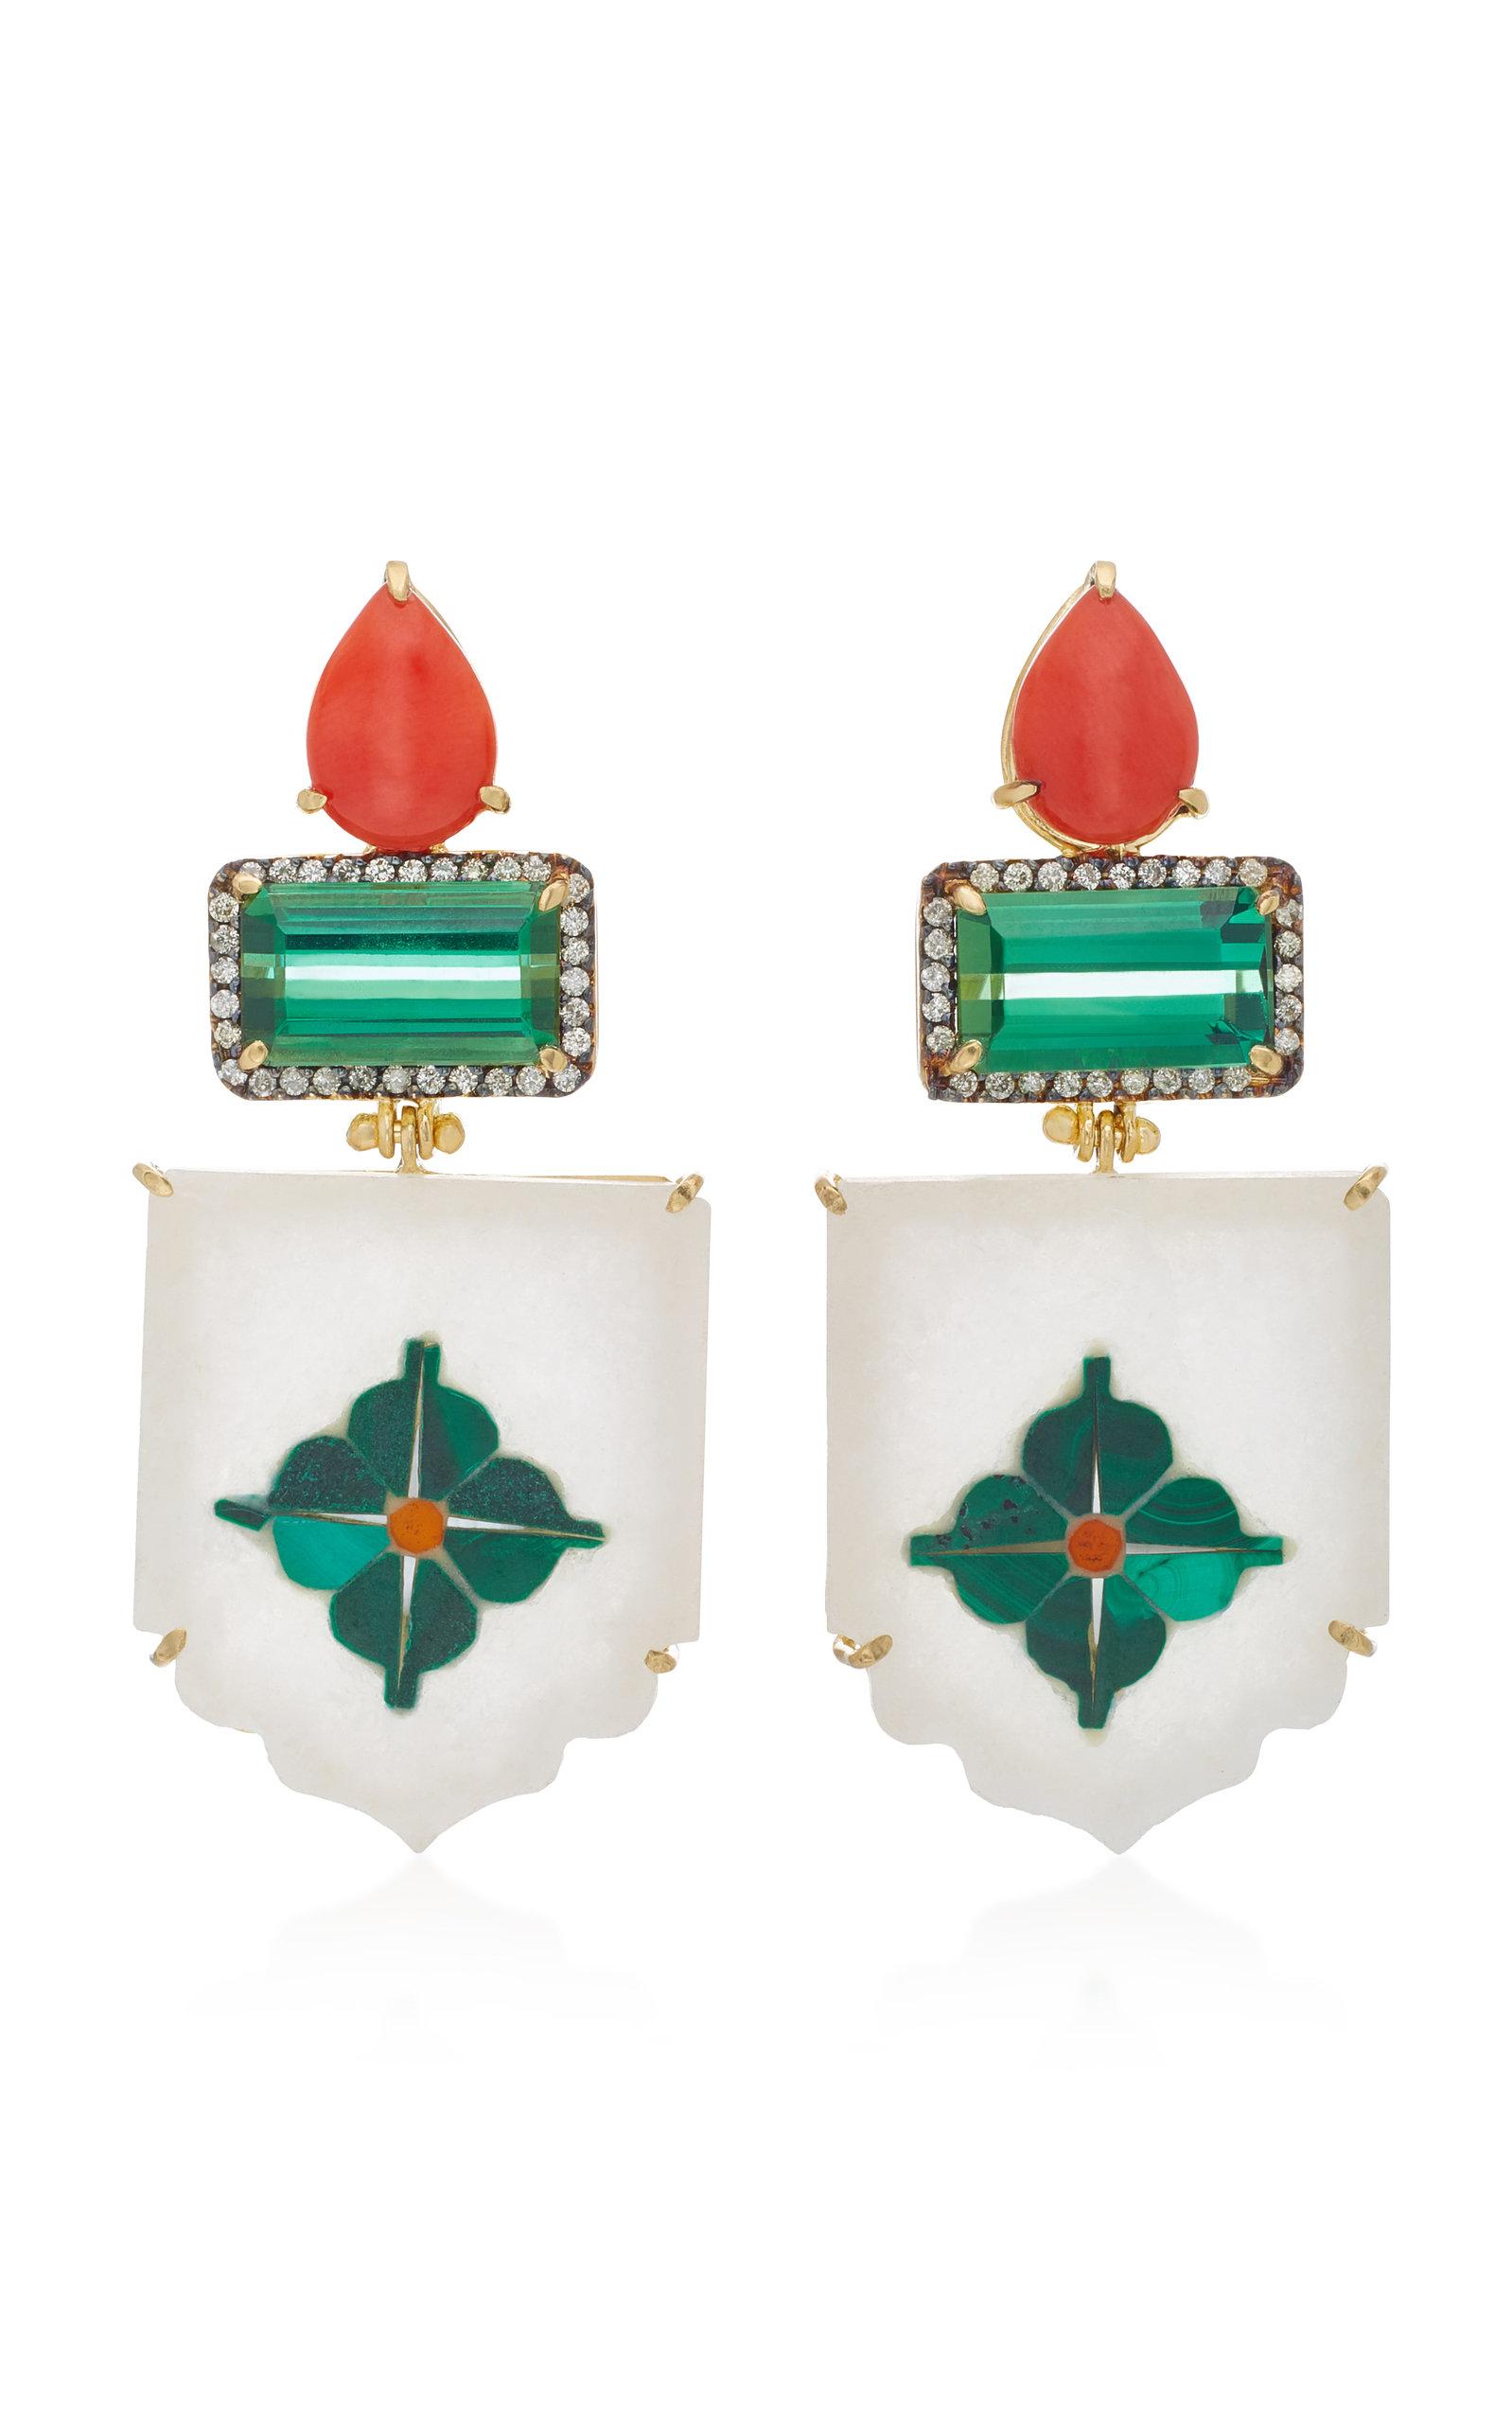 India Marble Mosaic Earrings Silvia Furmanovich y0I1X